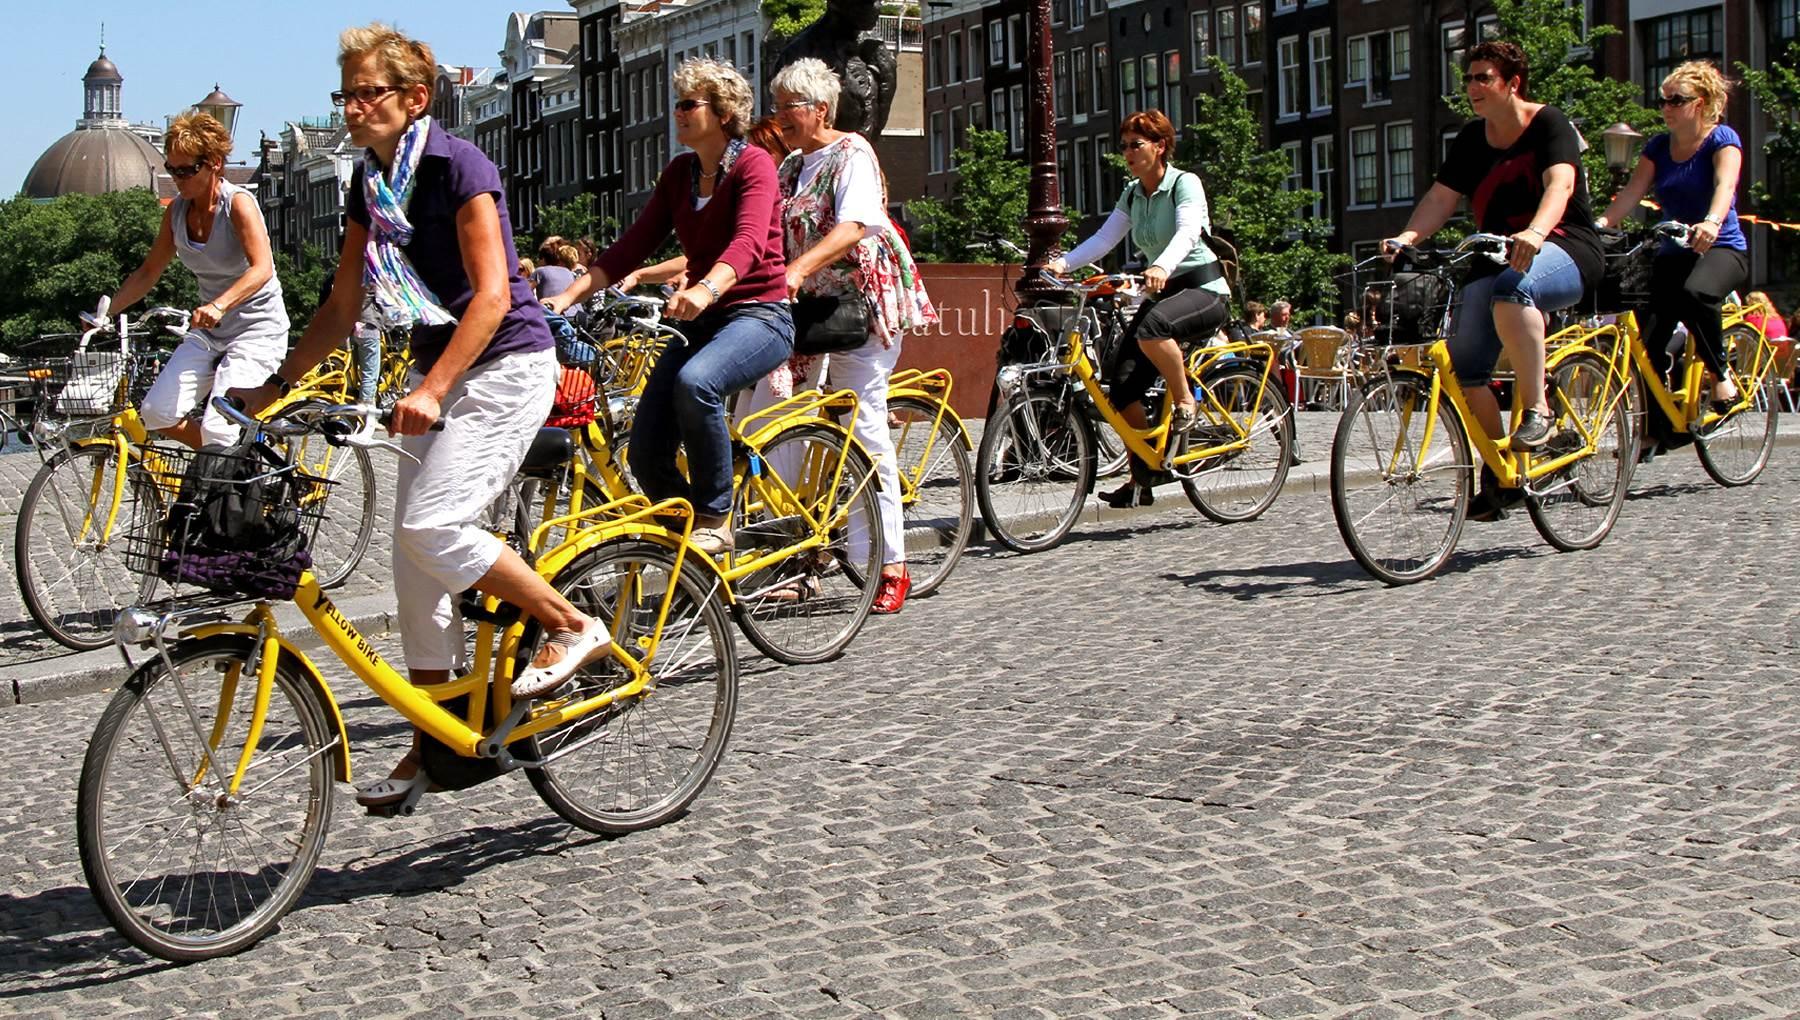 Bike tour in Amsterdam.Photo credit to IAmAmsterdam.com